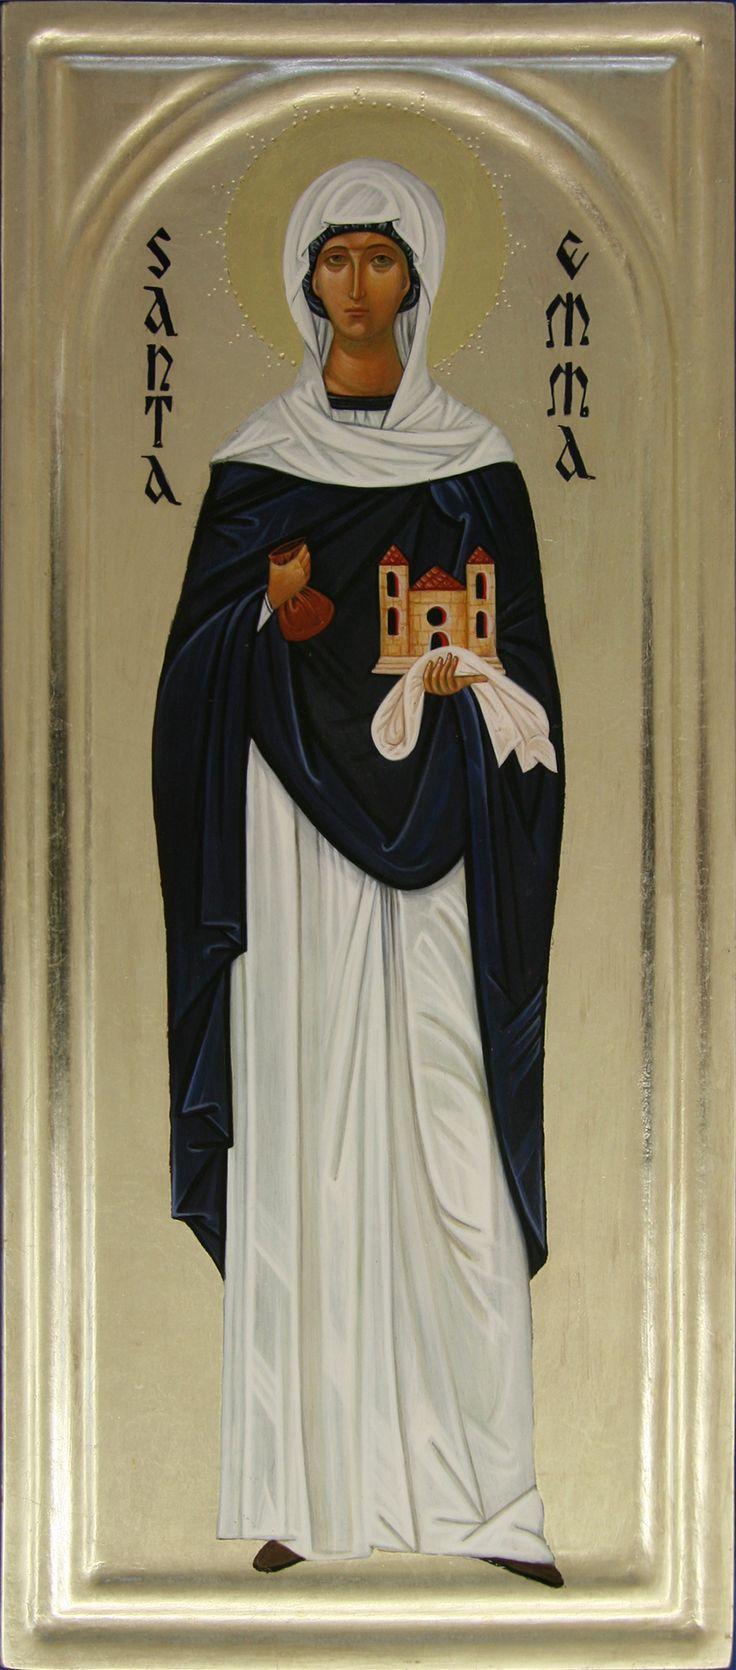 Santa Emma per mano di Maria Marciandi (Italy)